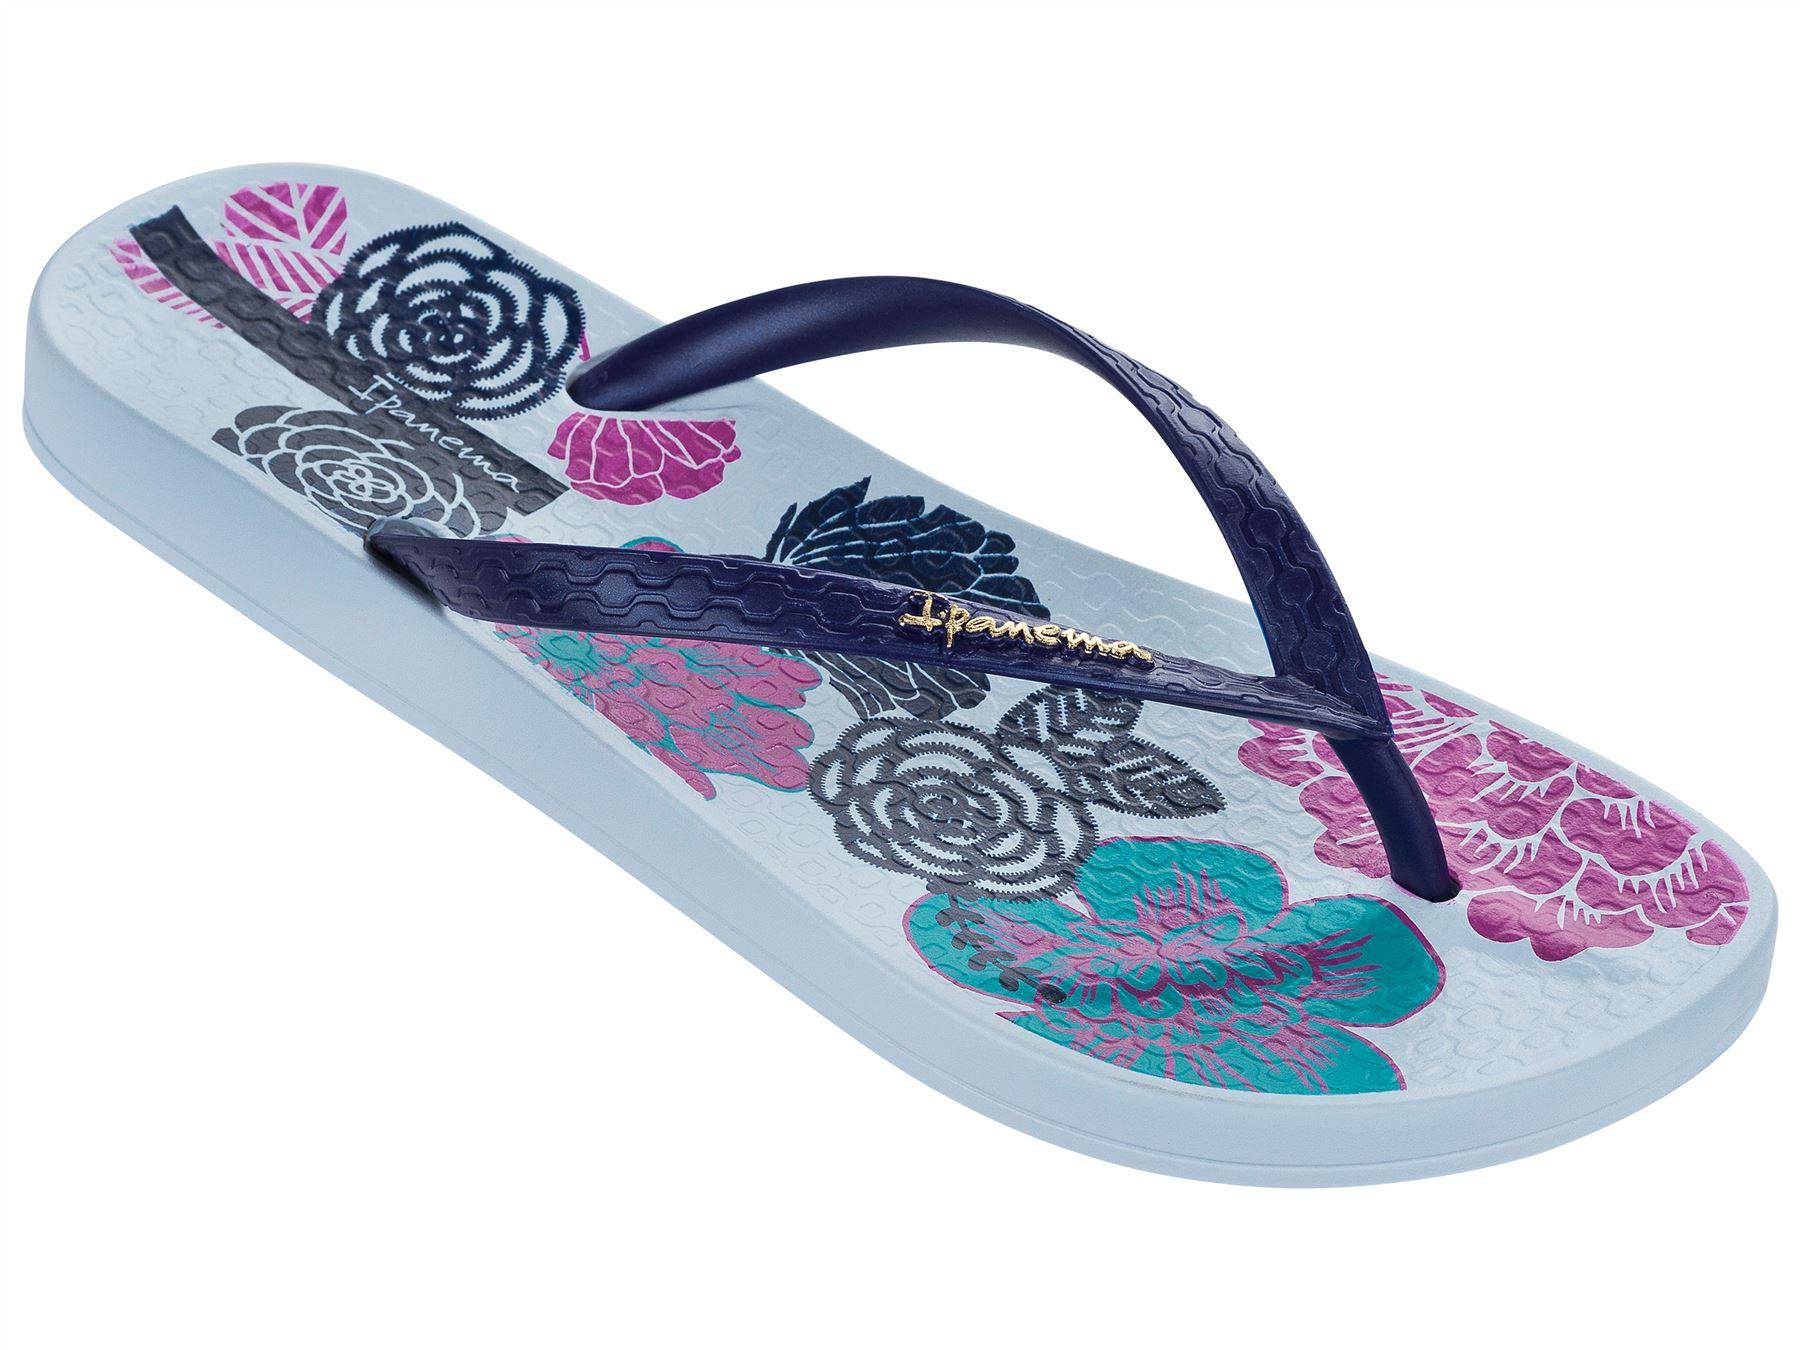 6d1689d9ca70 Ipanema Petal V Flowers Print Slim Footbed Flip Flops Beach Sandals ...